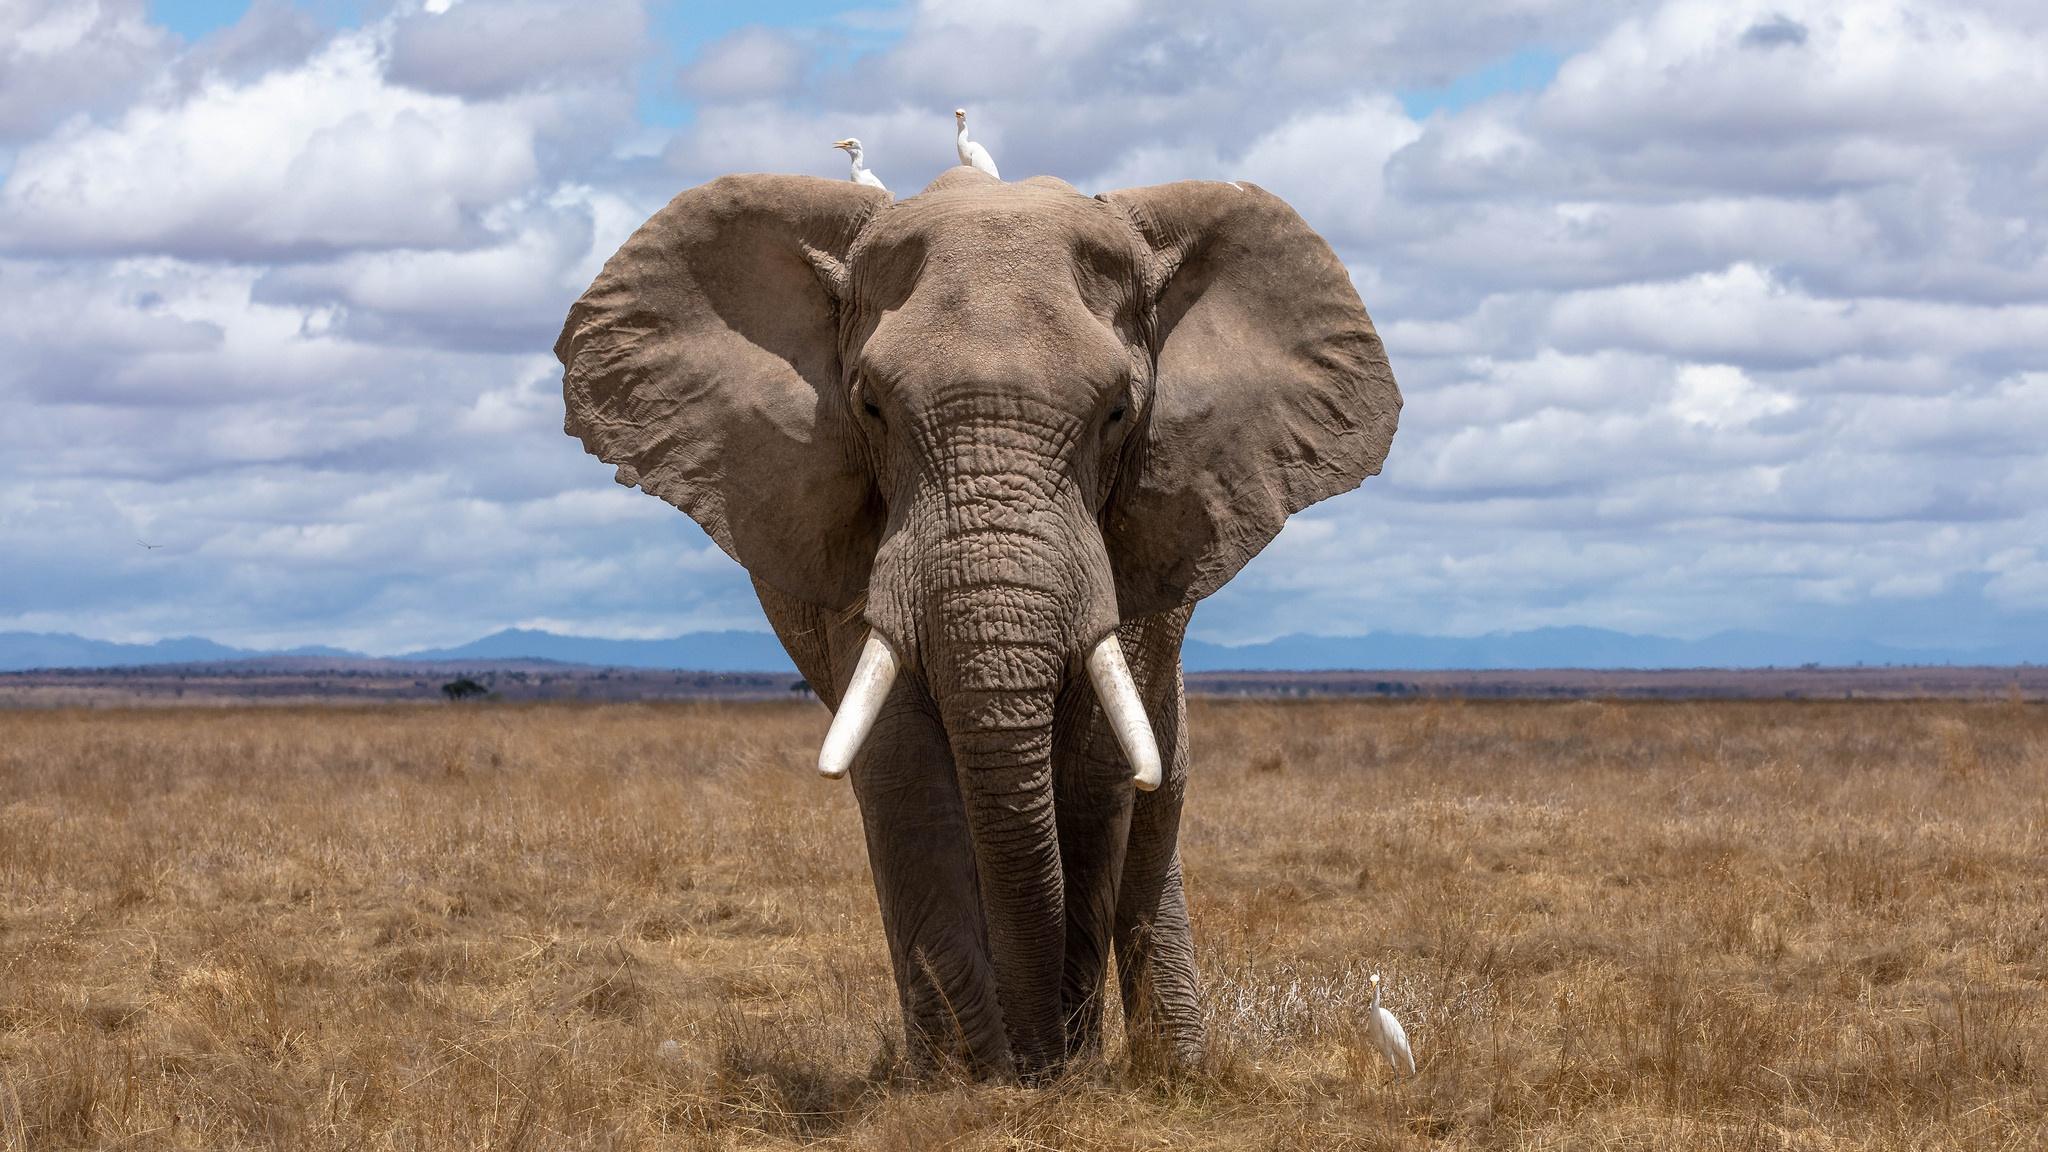 Elephant Wildlife 2048x1152